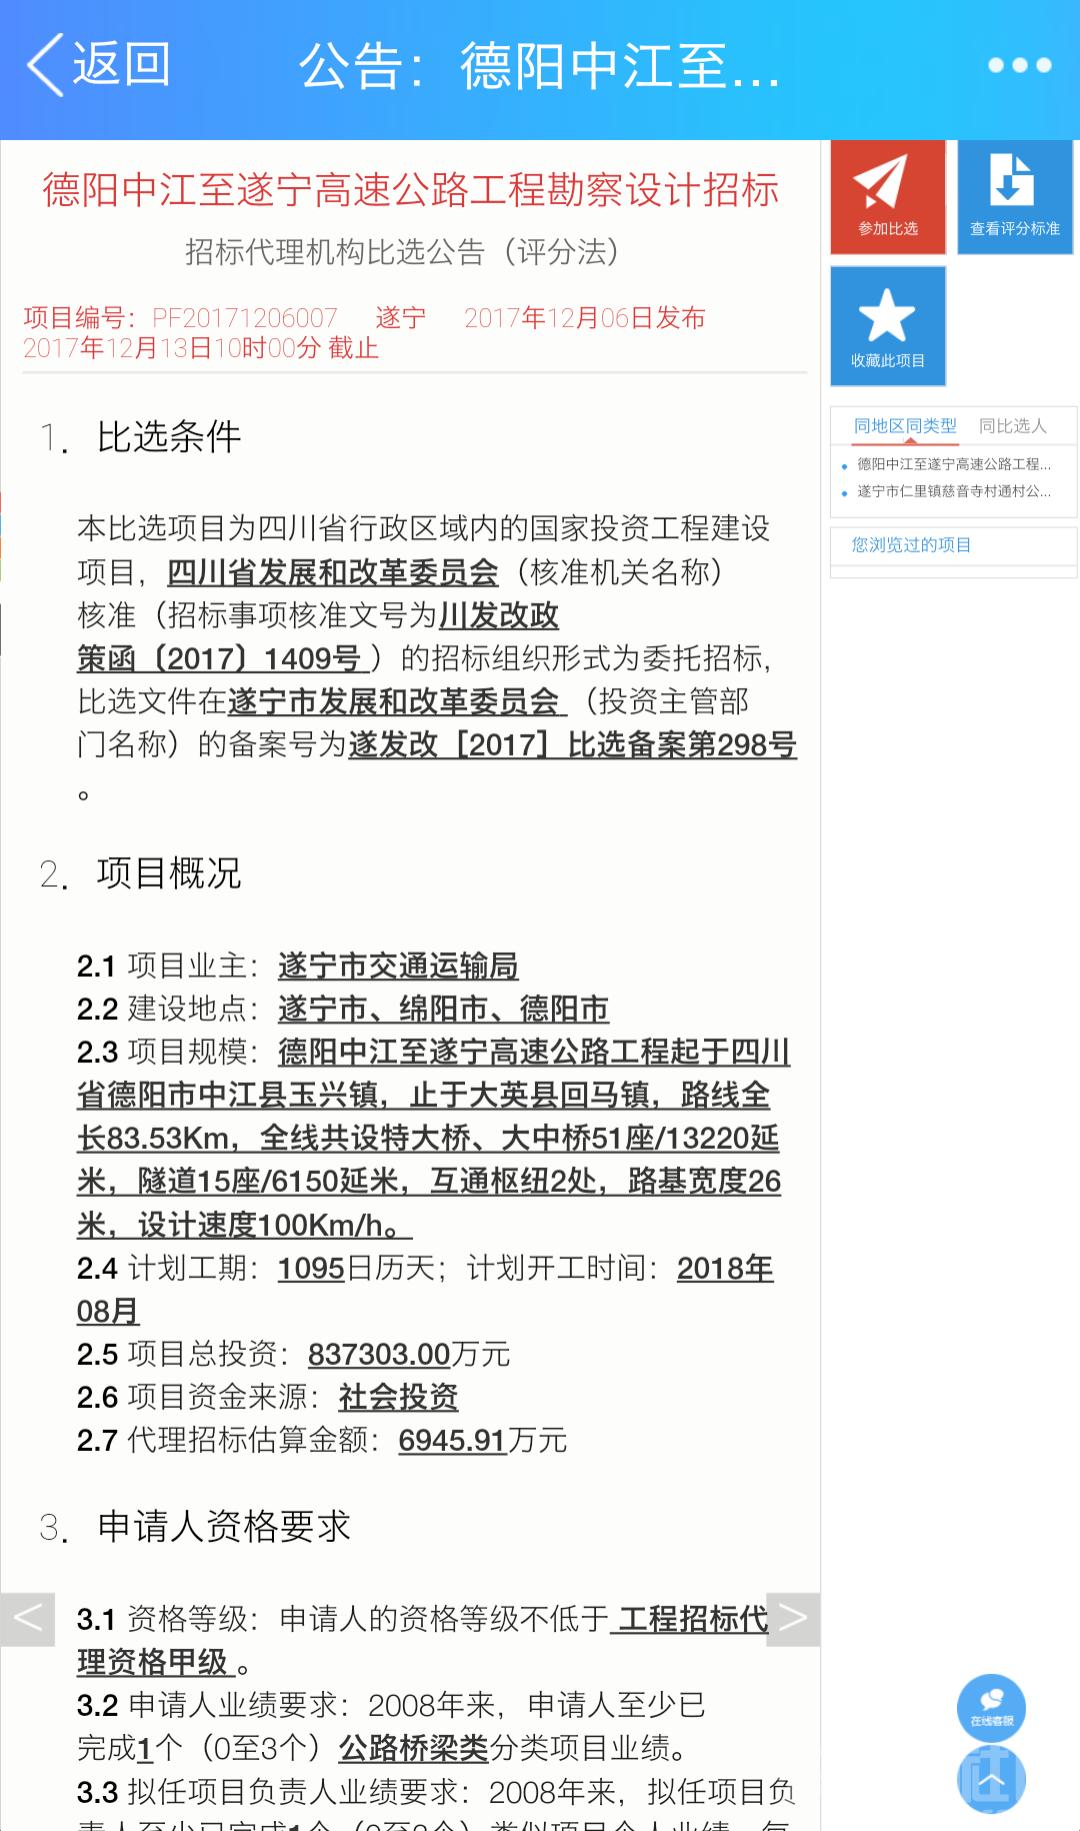 Screenshot_2017-12-06-16-09-51-536_QQ.png